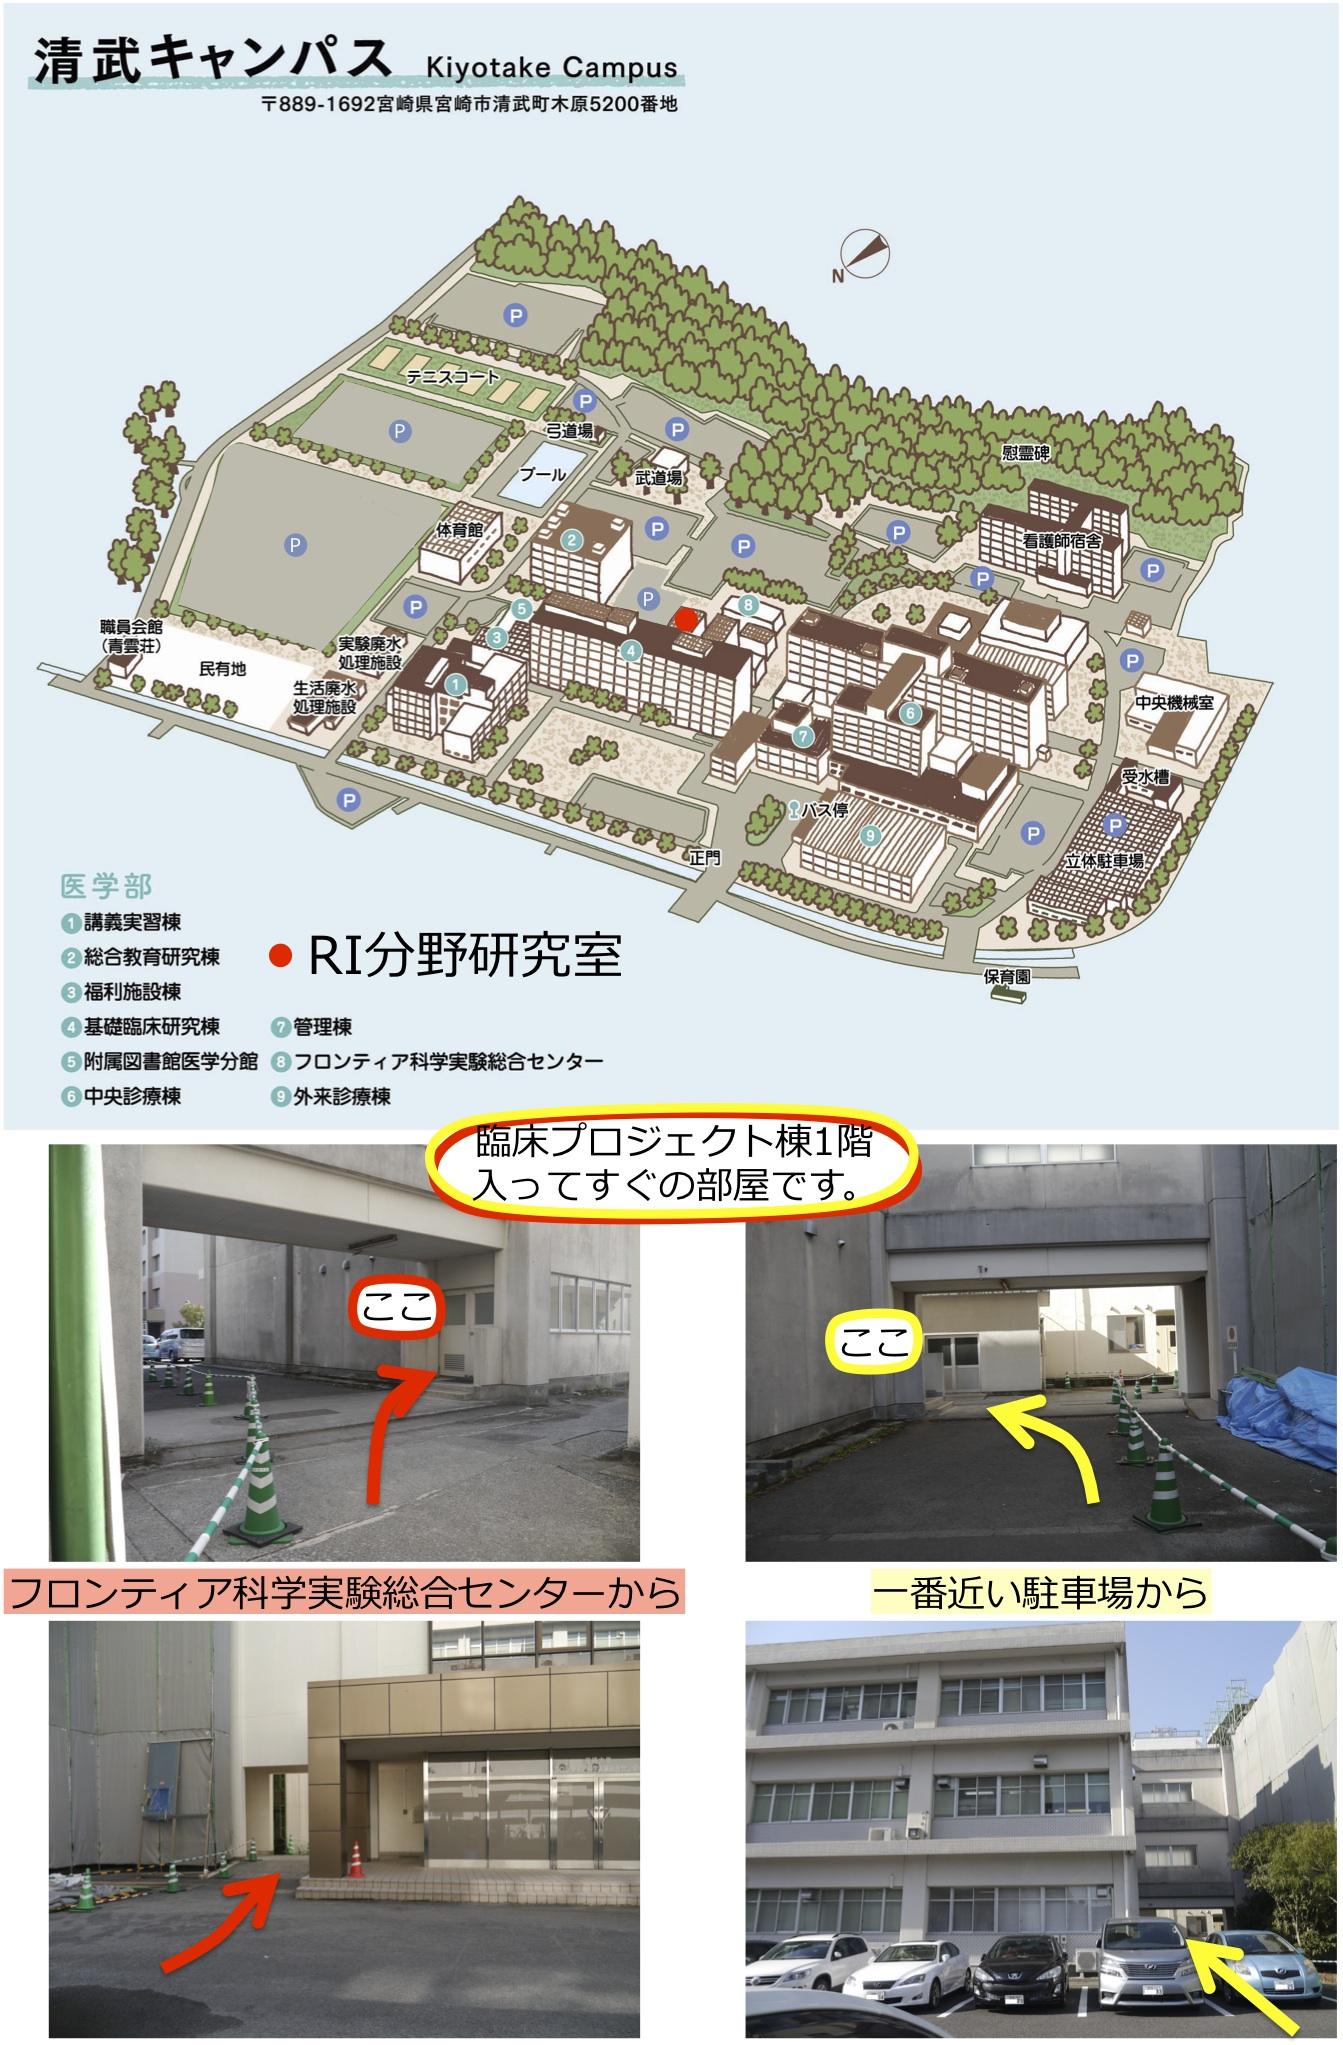 image_725.jpg